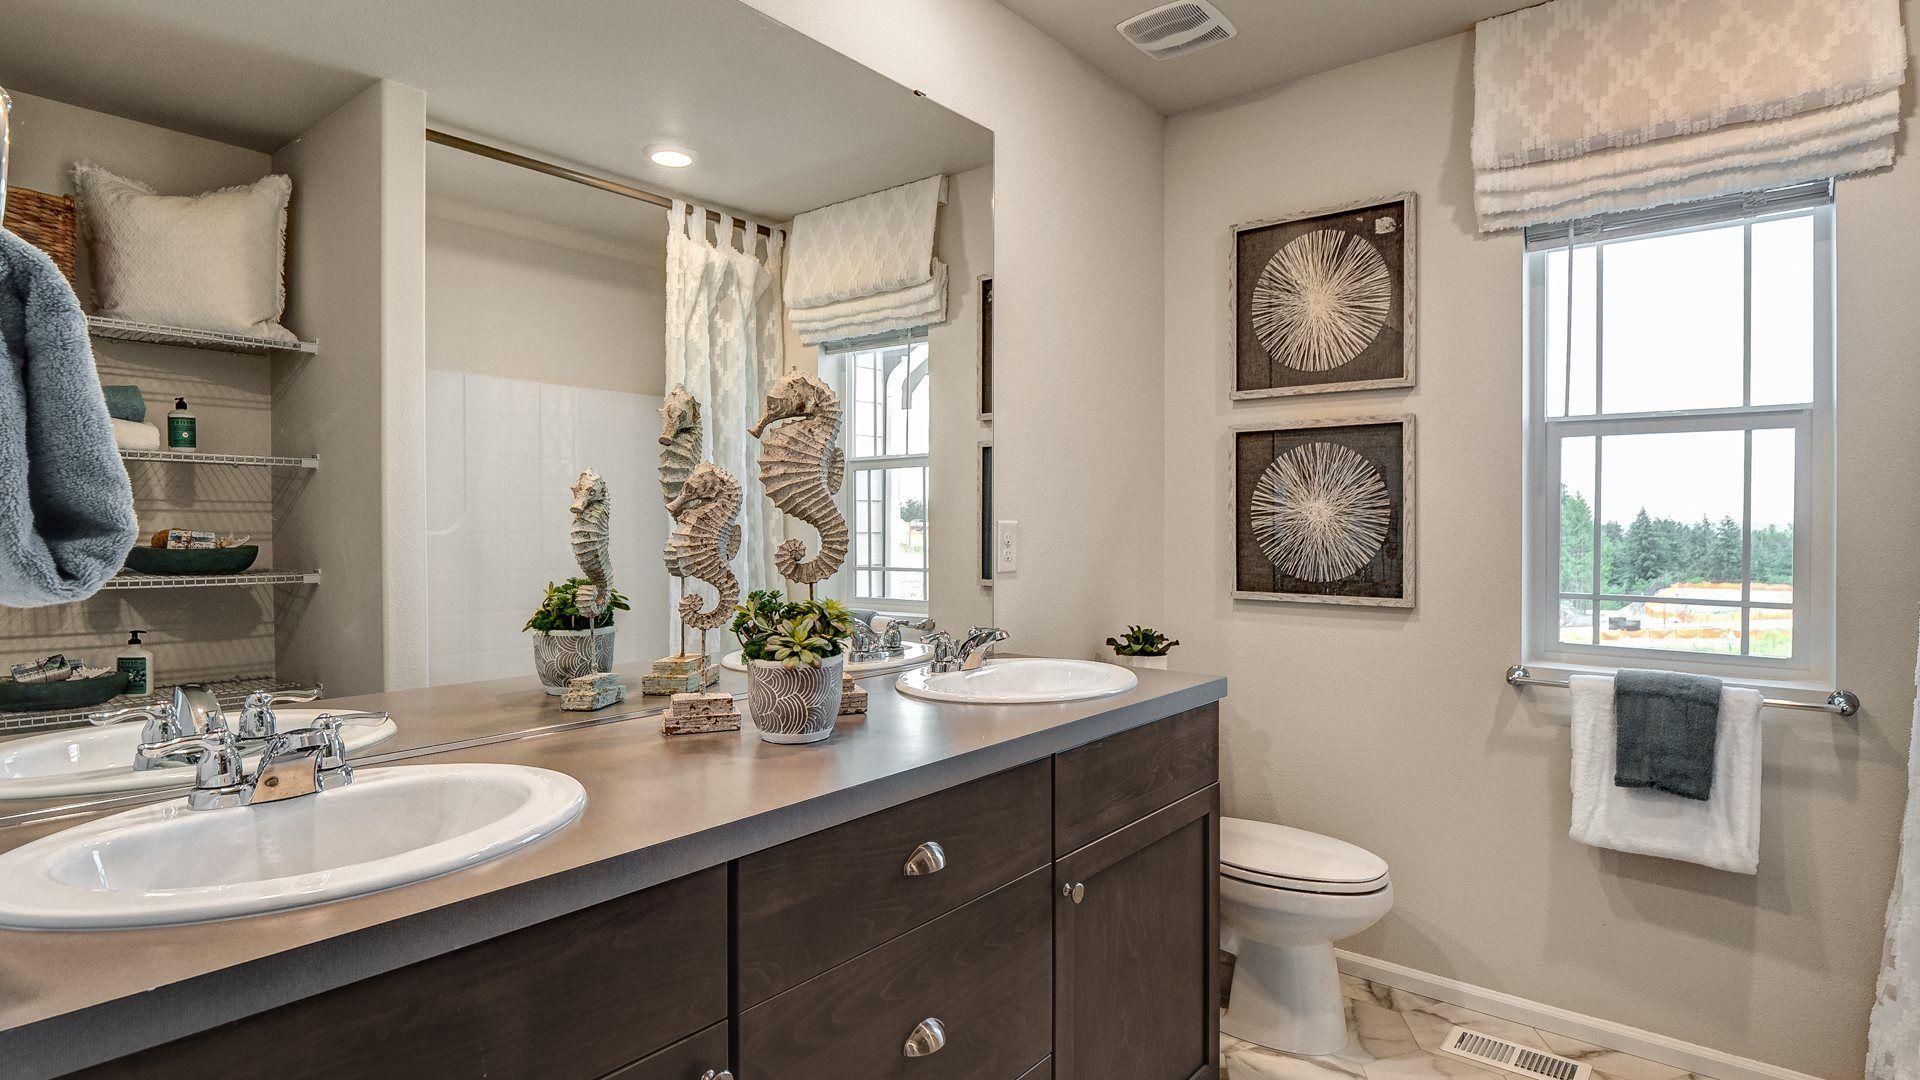 Bathroom featured in the Stevenson By Lennar in Bremerton, WA